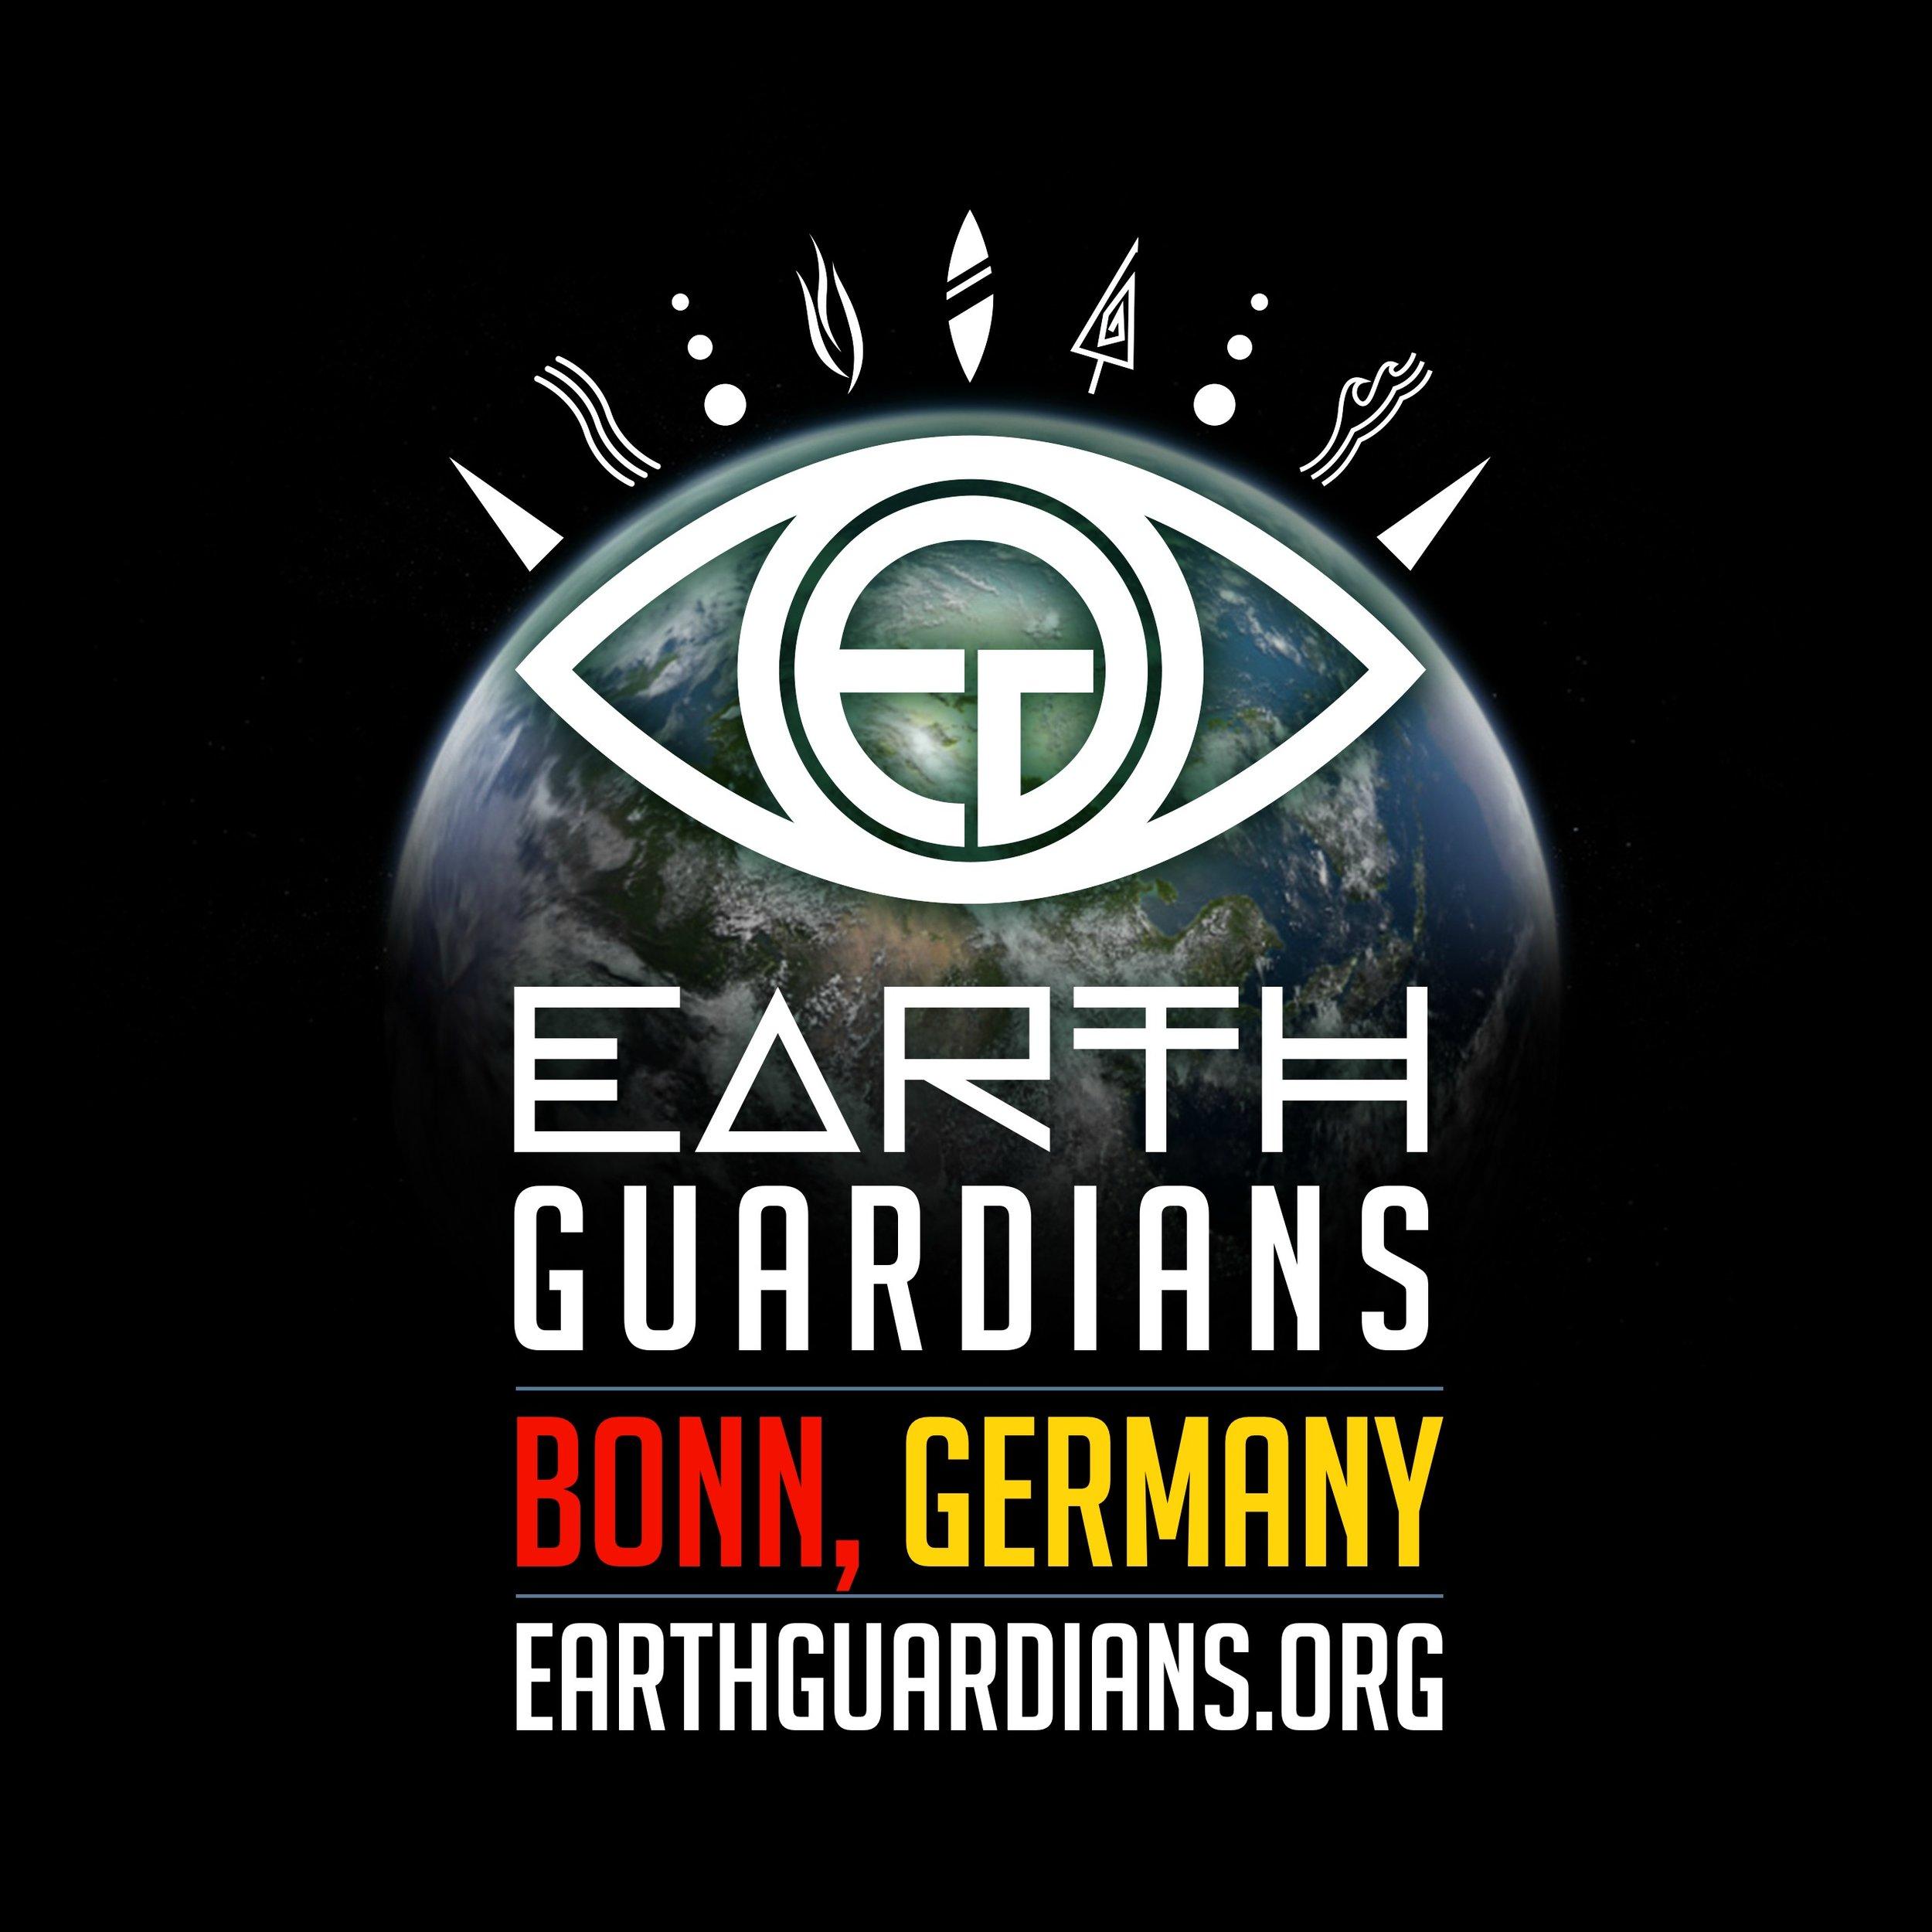 EG_crew logo BONN.jpg